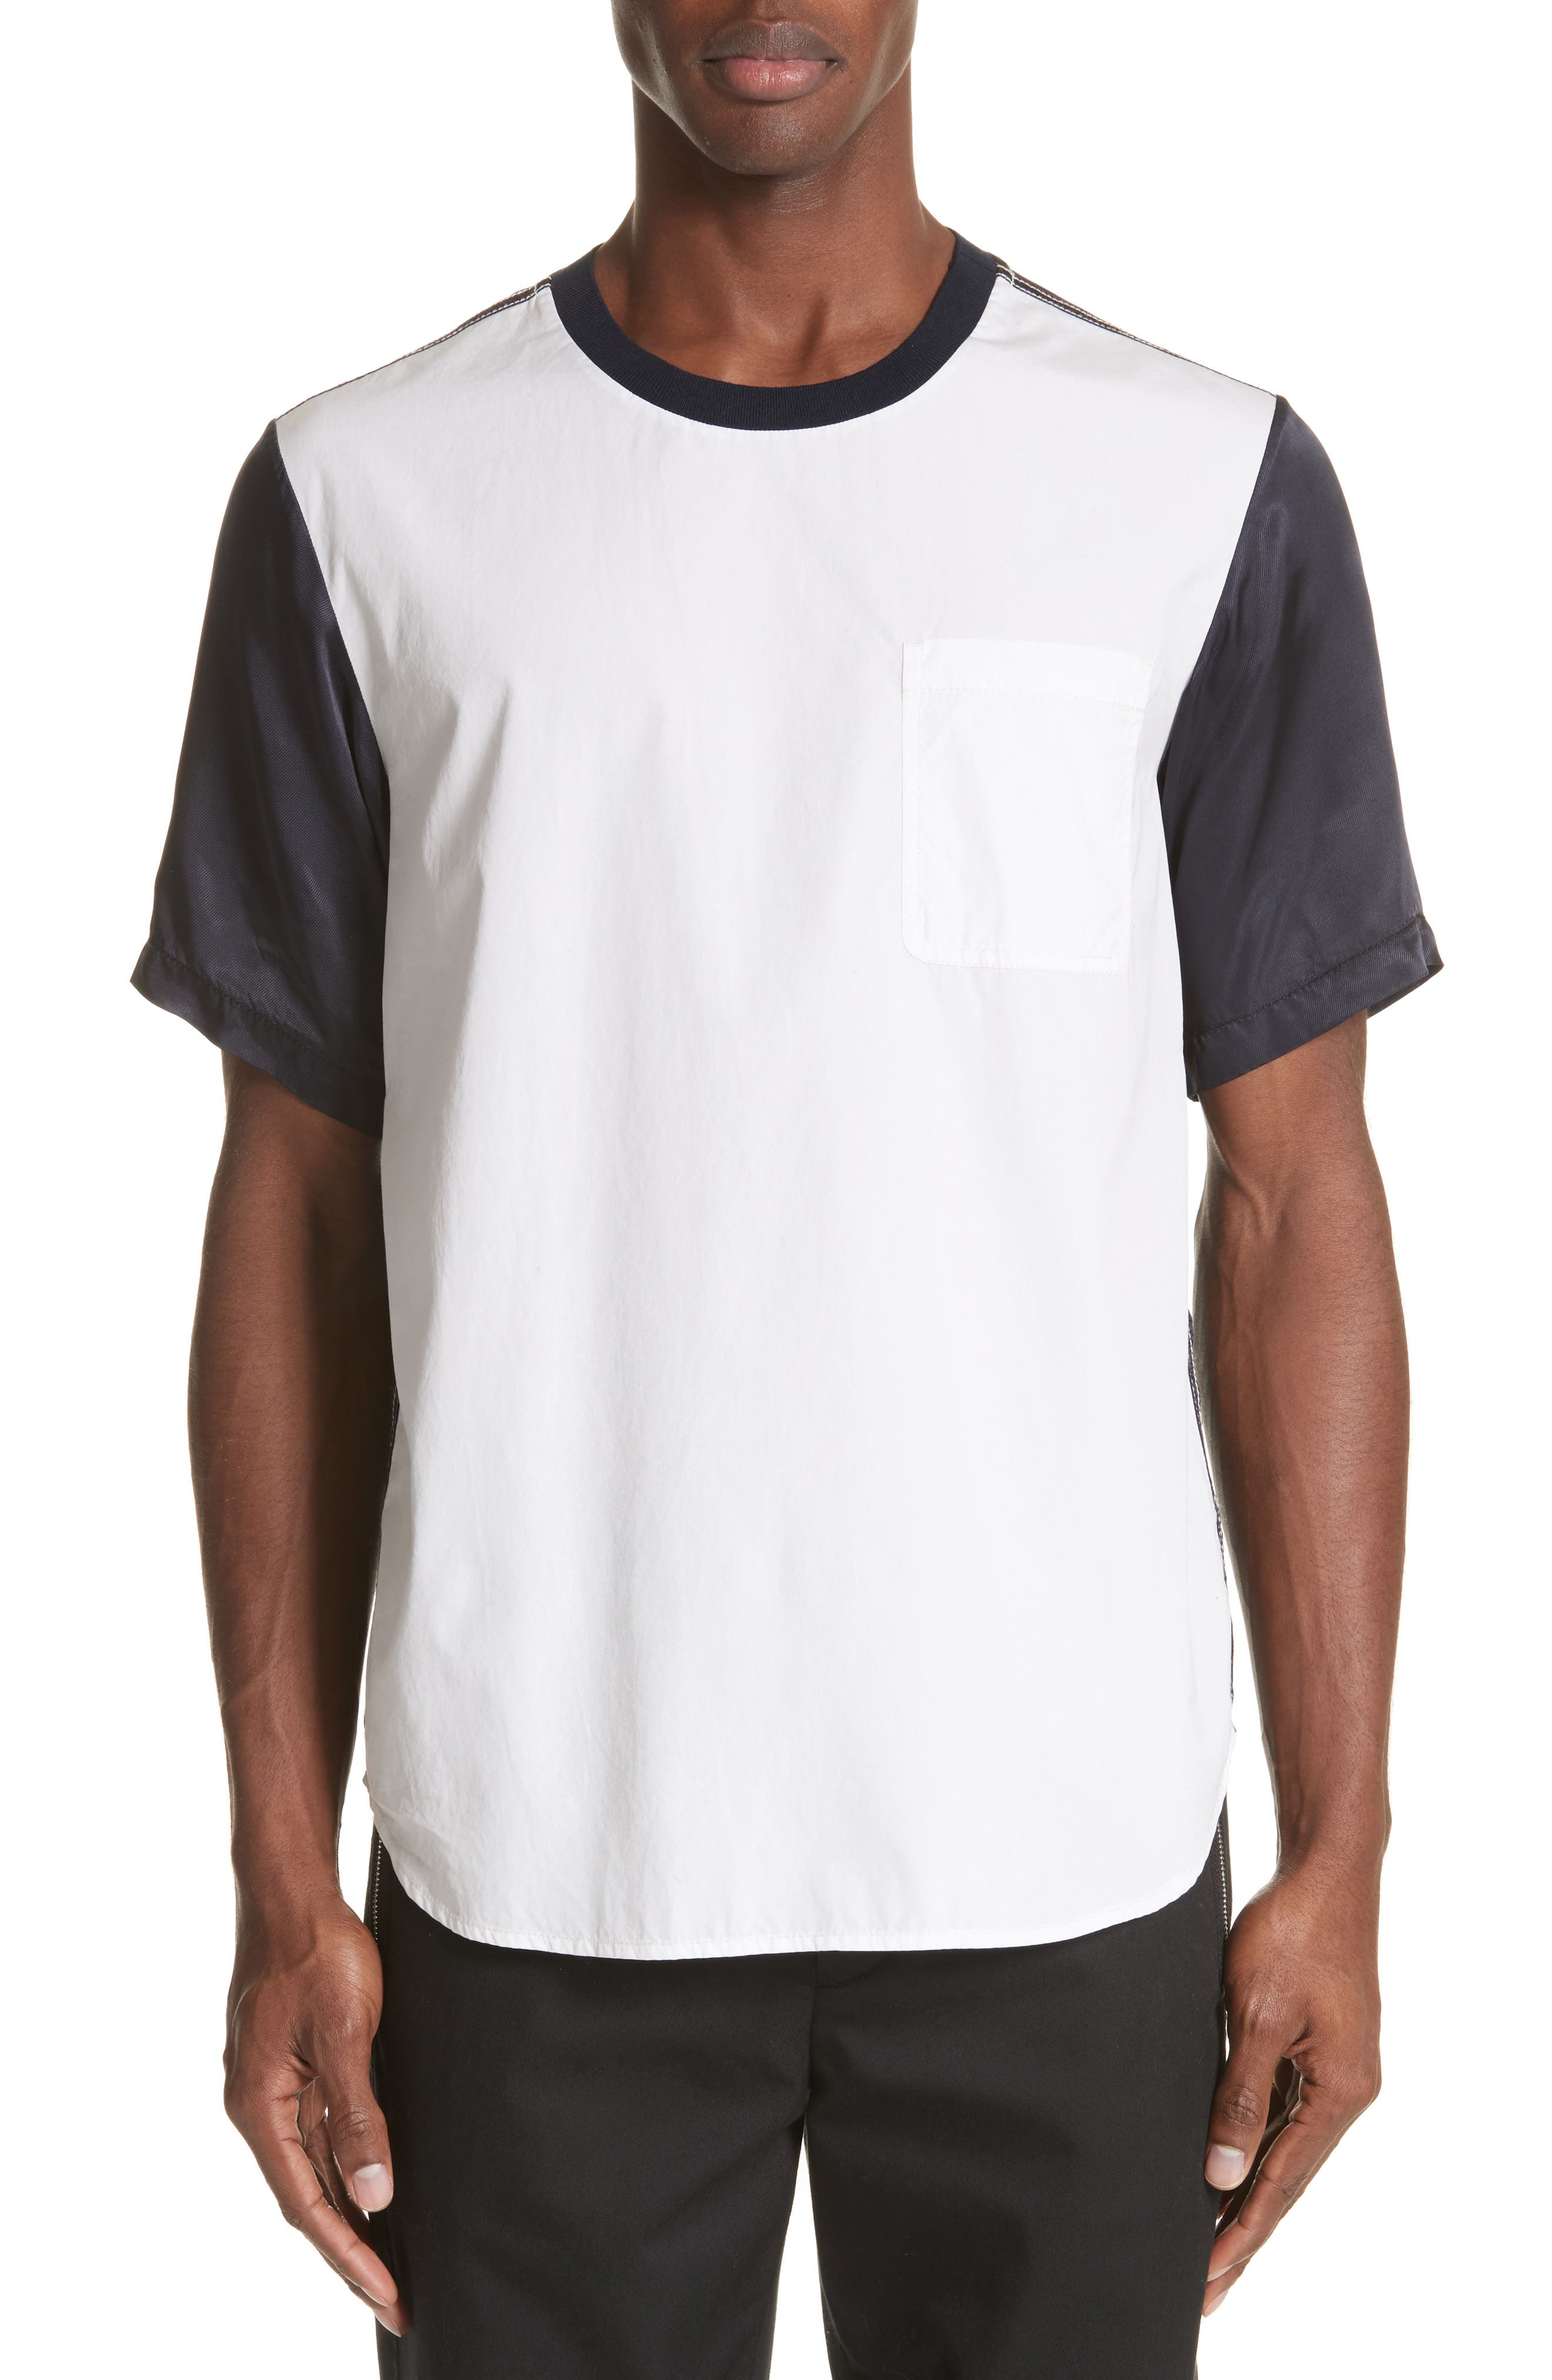 3.1 Phillip Lim Colorblock Rayon & Cotton T-Shirt